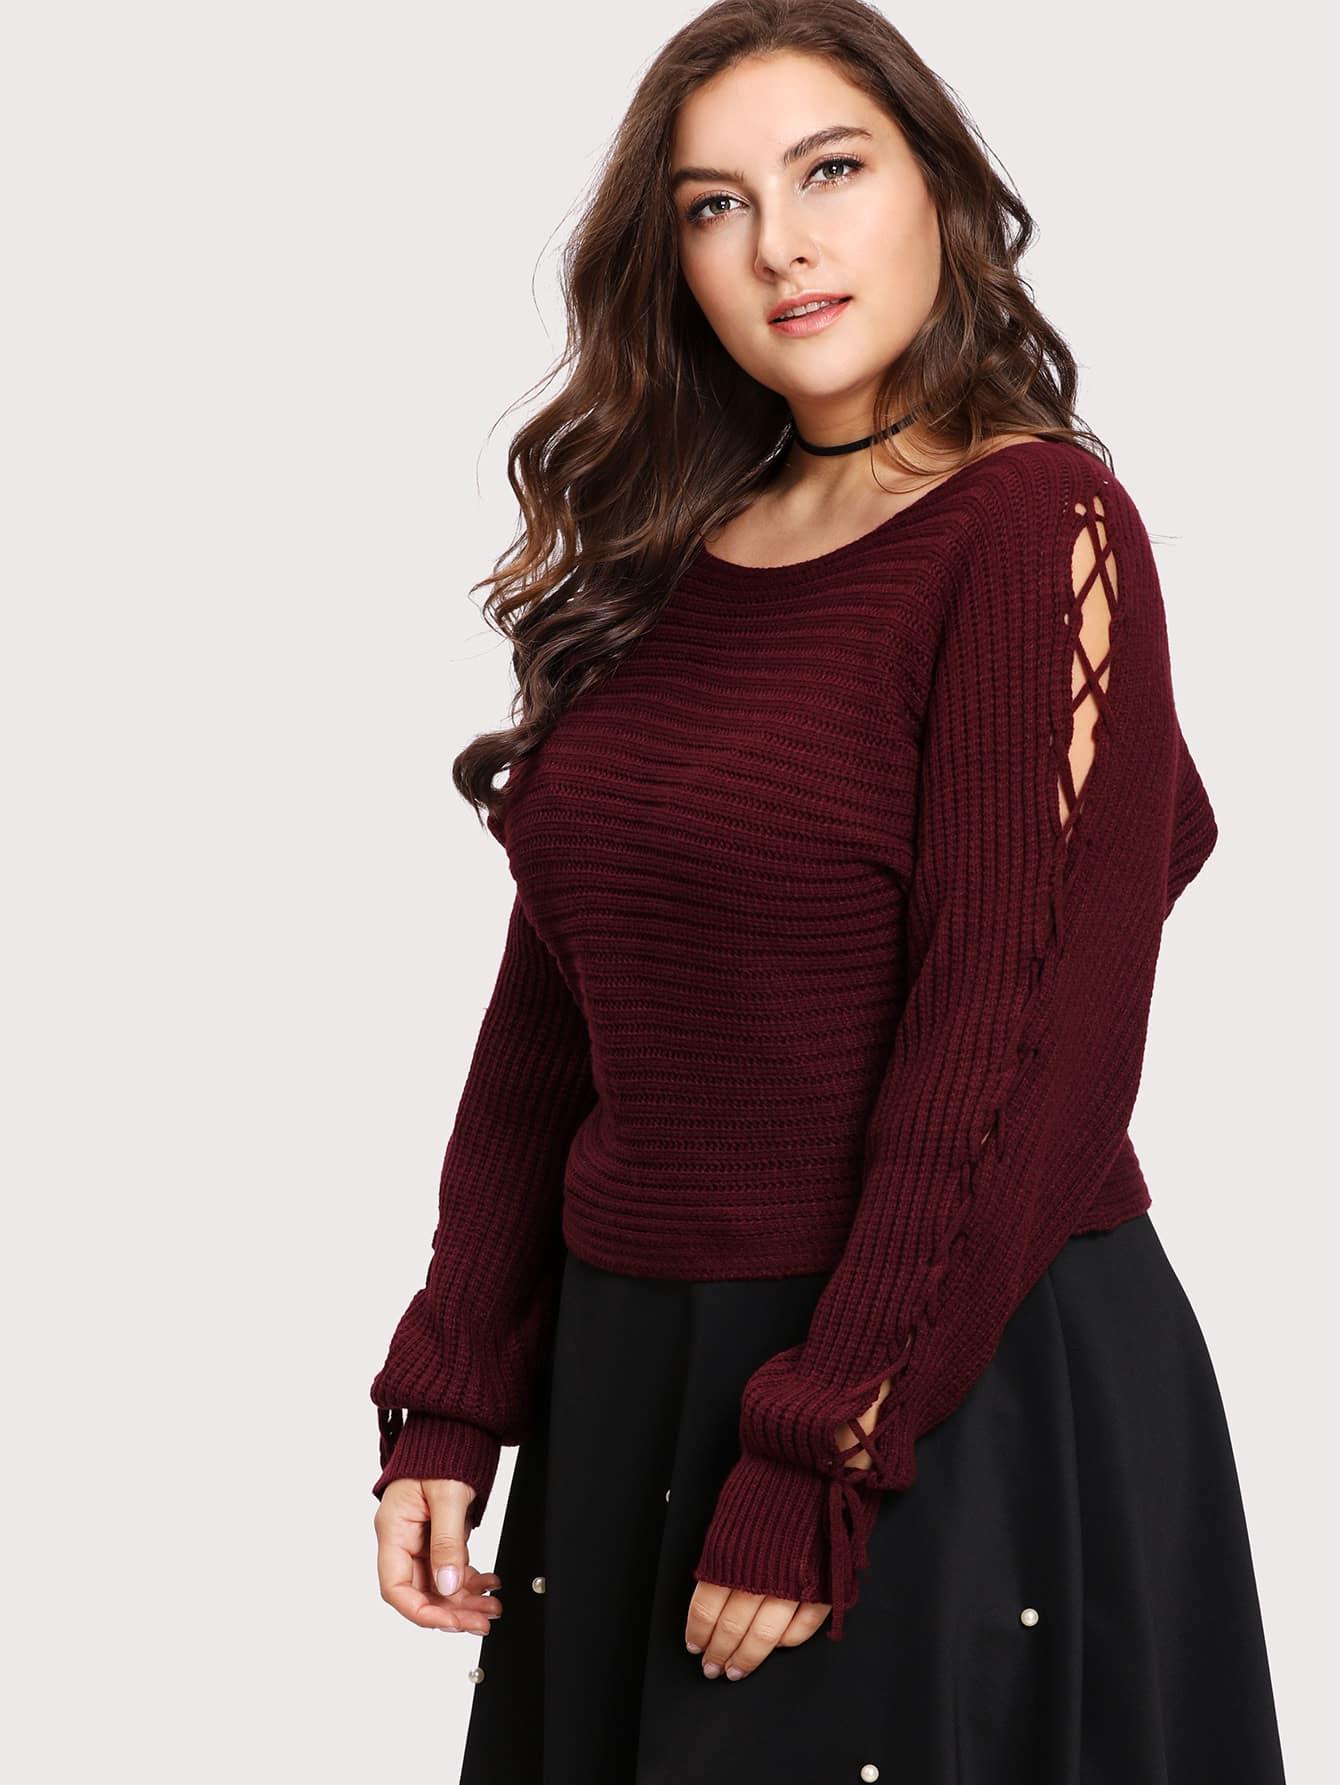 Lace Up Sleeve Waffle Knit Sweater lace up sleeve waffle knit sweater